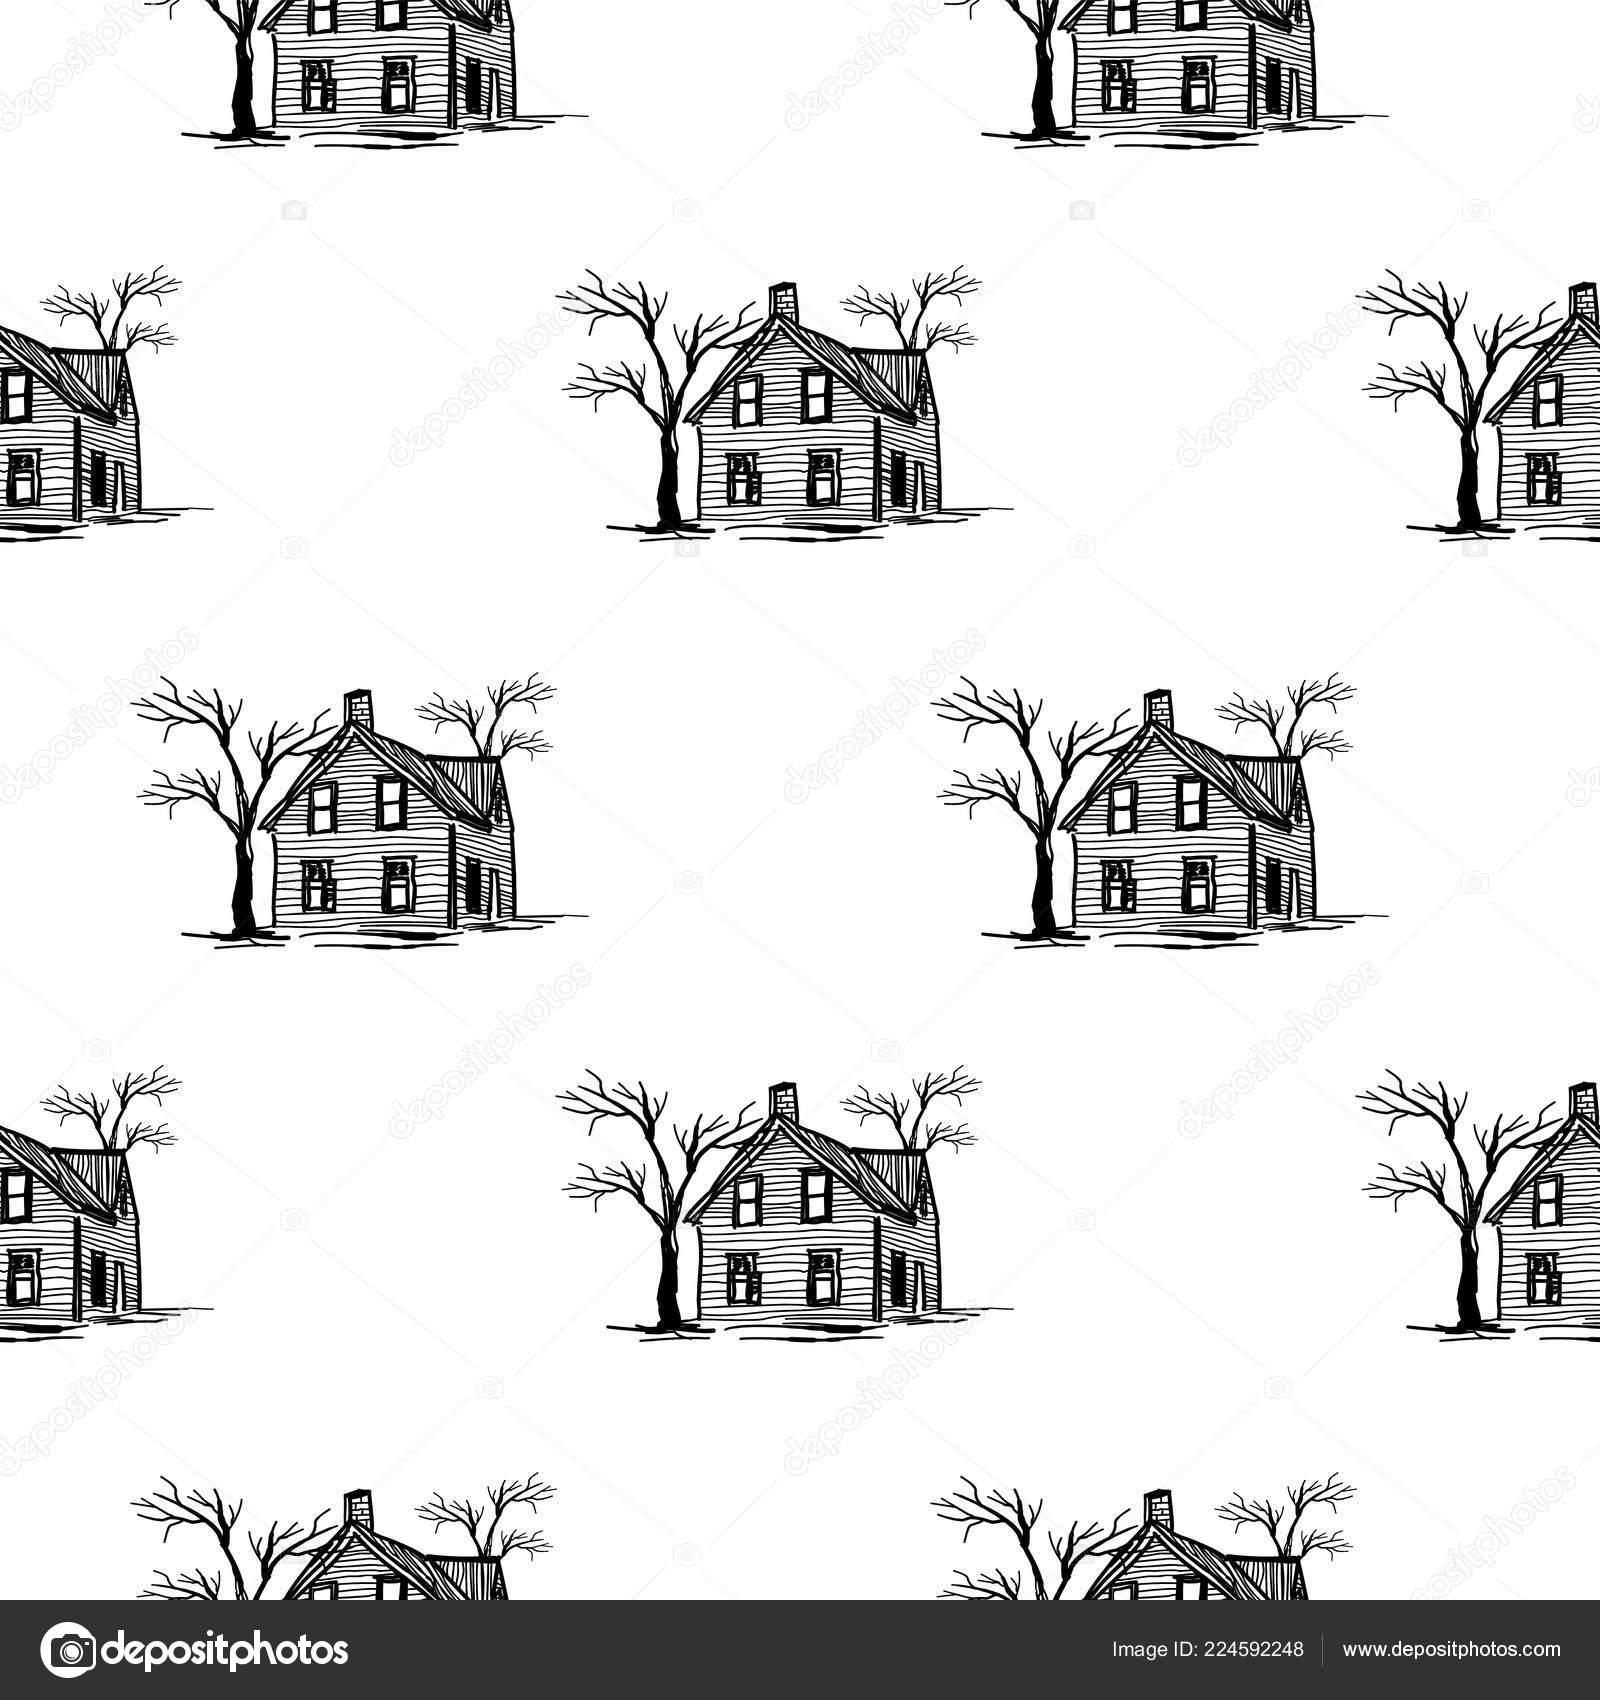 Halloween Spooky House Drawing.Drawings Of Haunted House Halloween Pattern Spooky